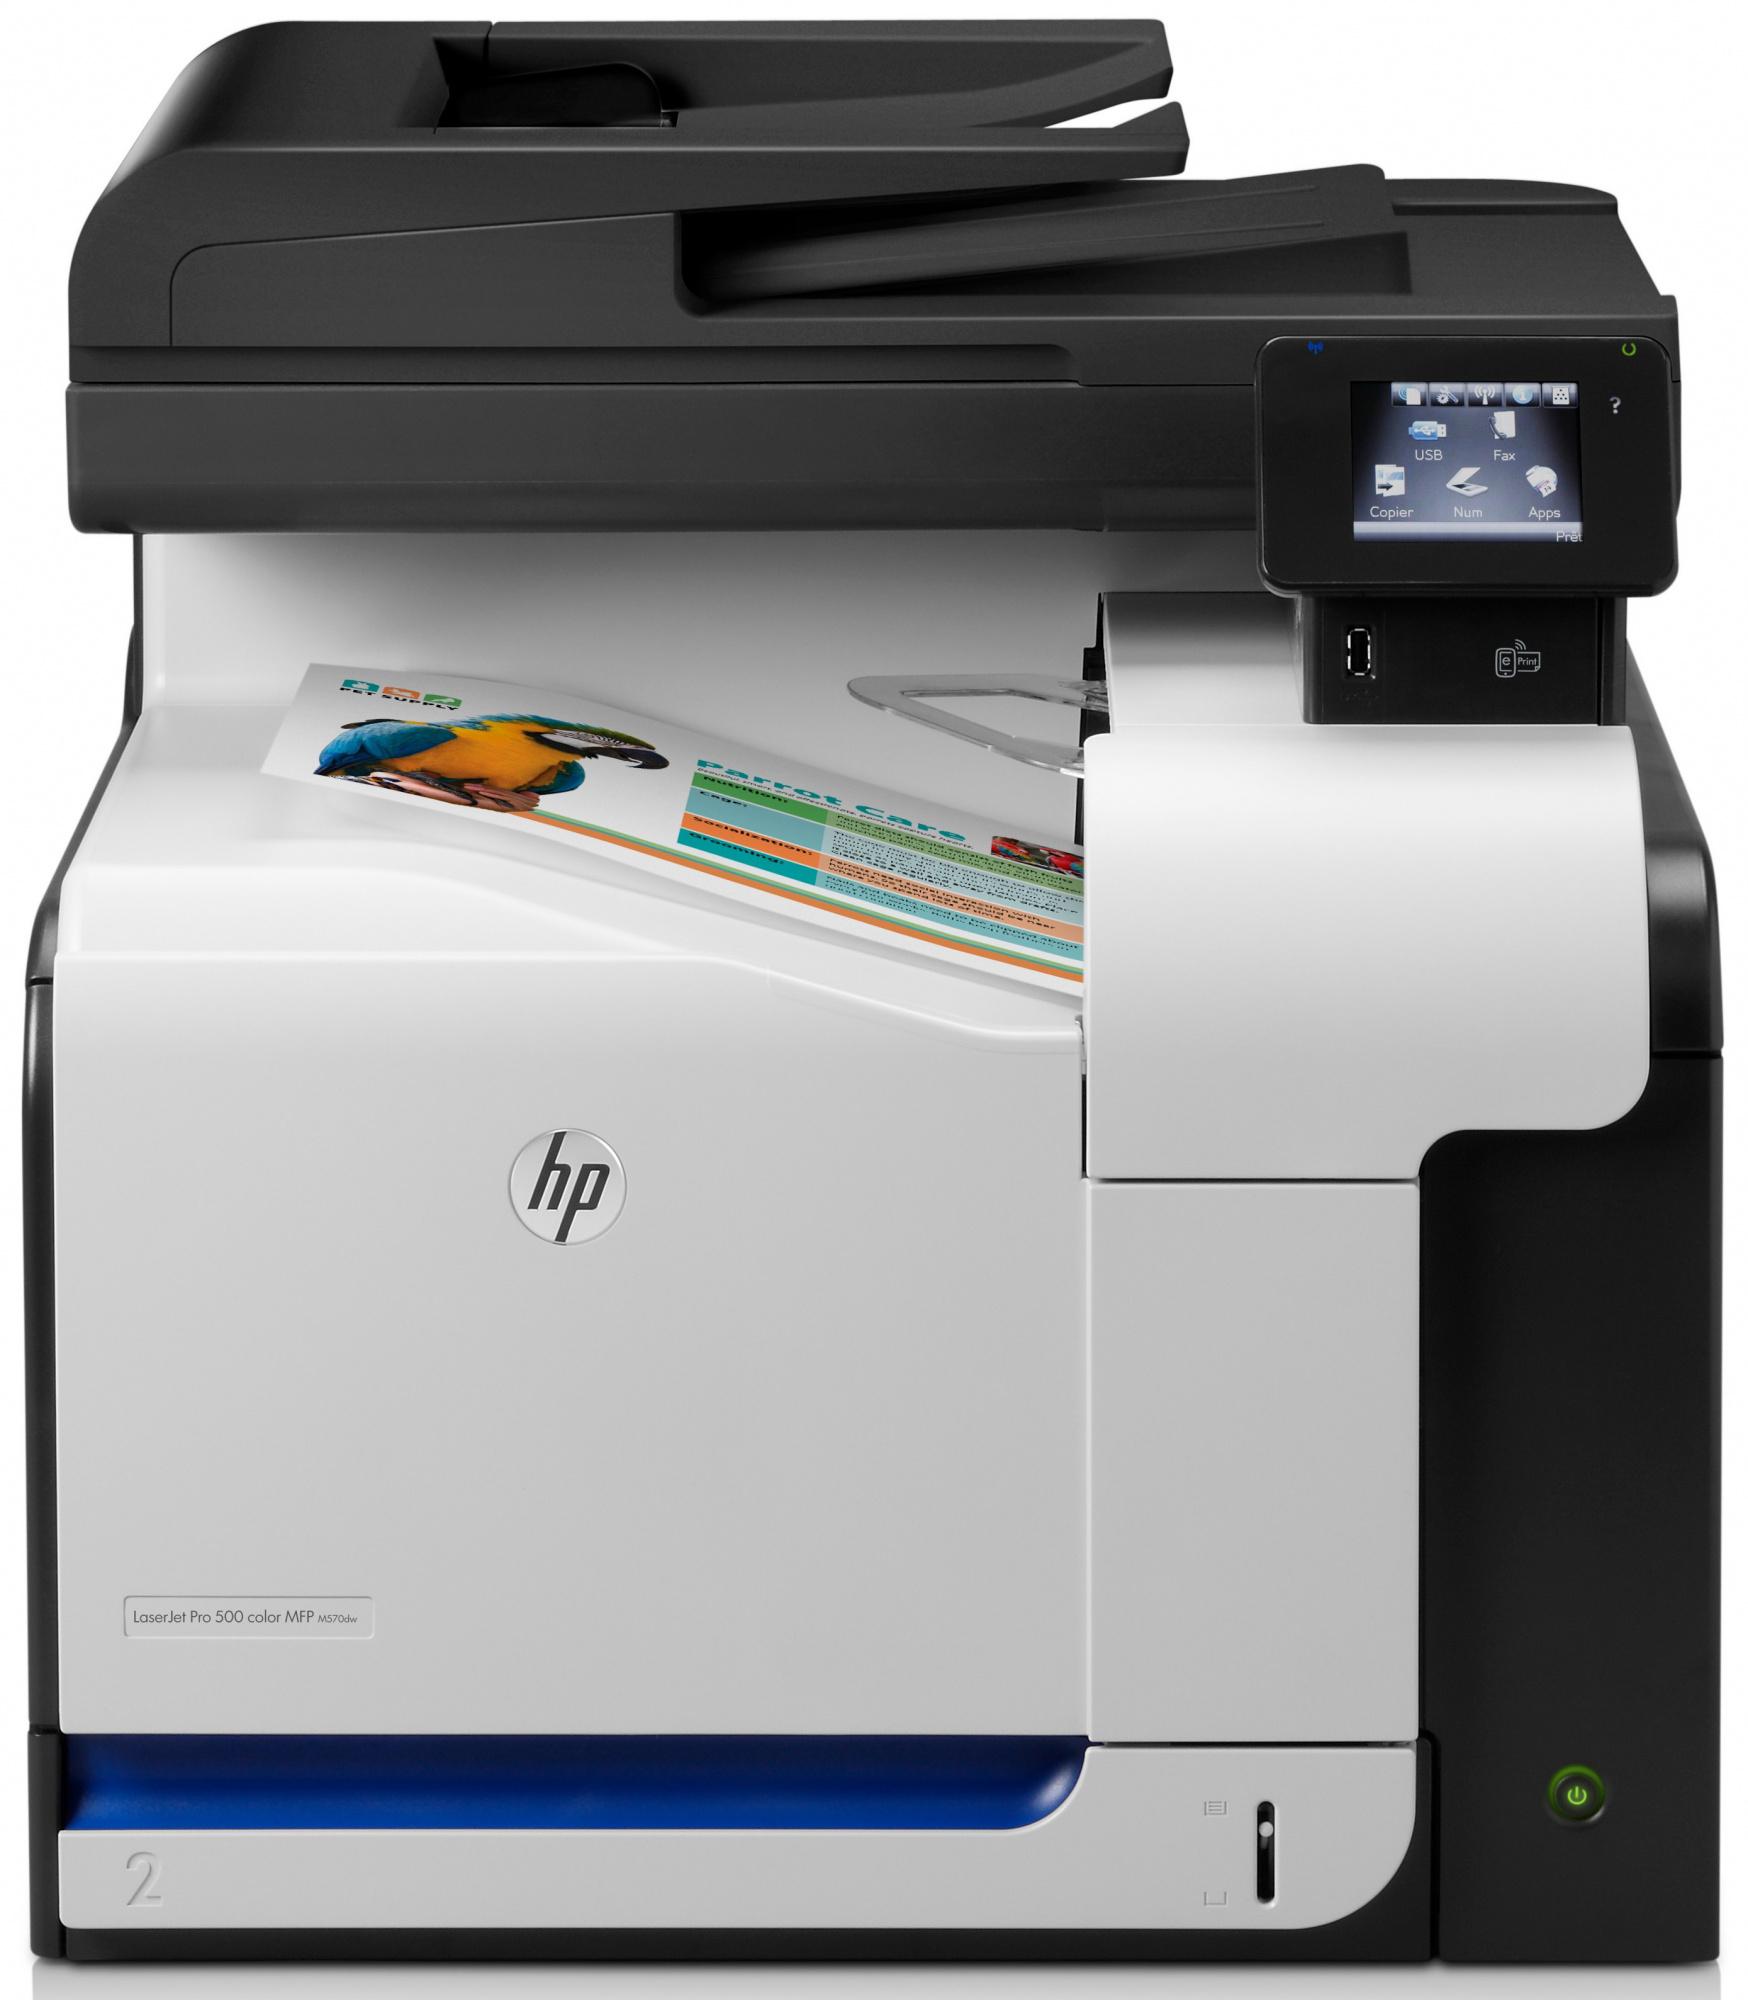 Color LaserJet Pro 500